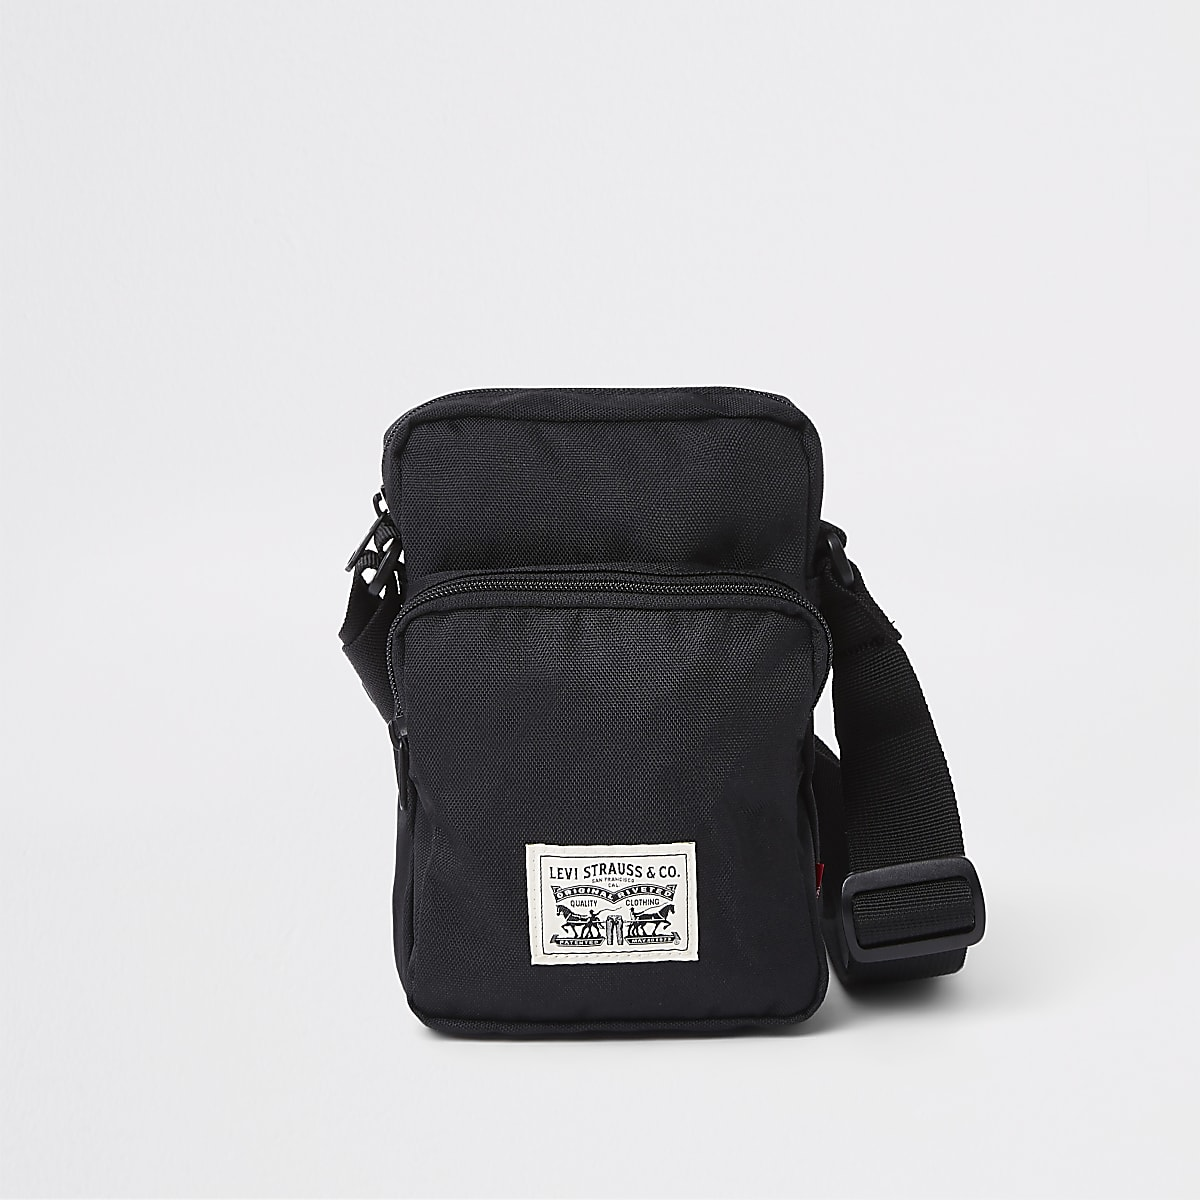 Levi's black mini cross bodyflight pouch